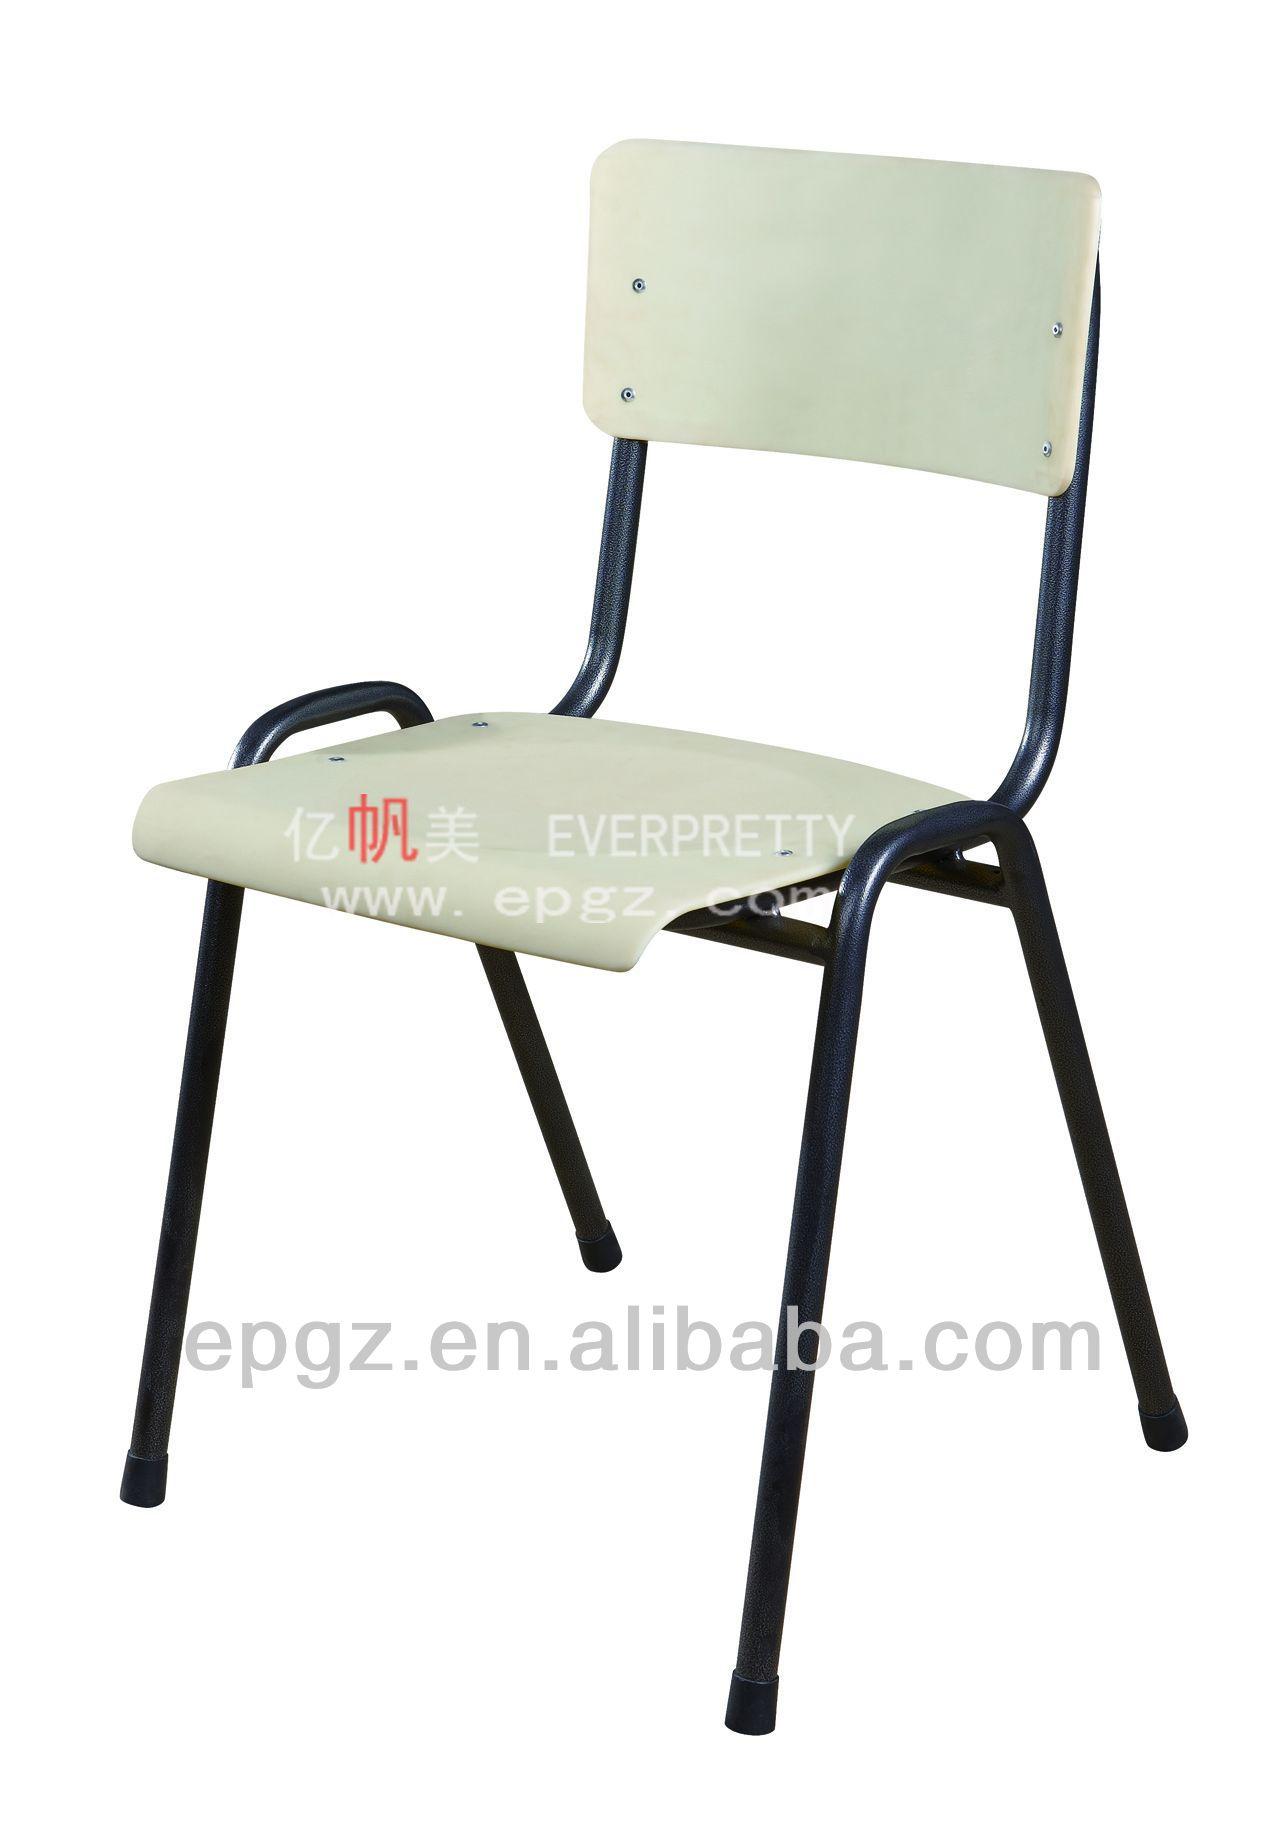 Stuhl schule  Holz Billig Vintage Schule Stühle,Alten Studenten Stuhl - Buy ...